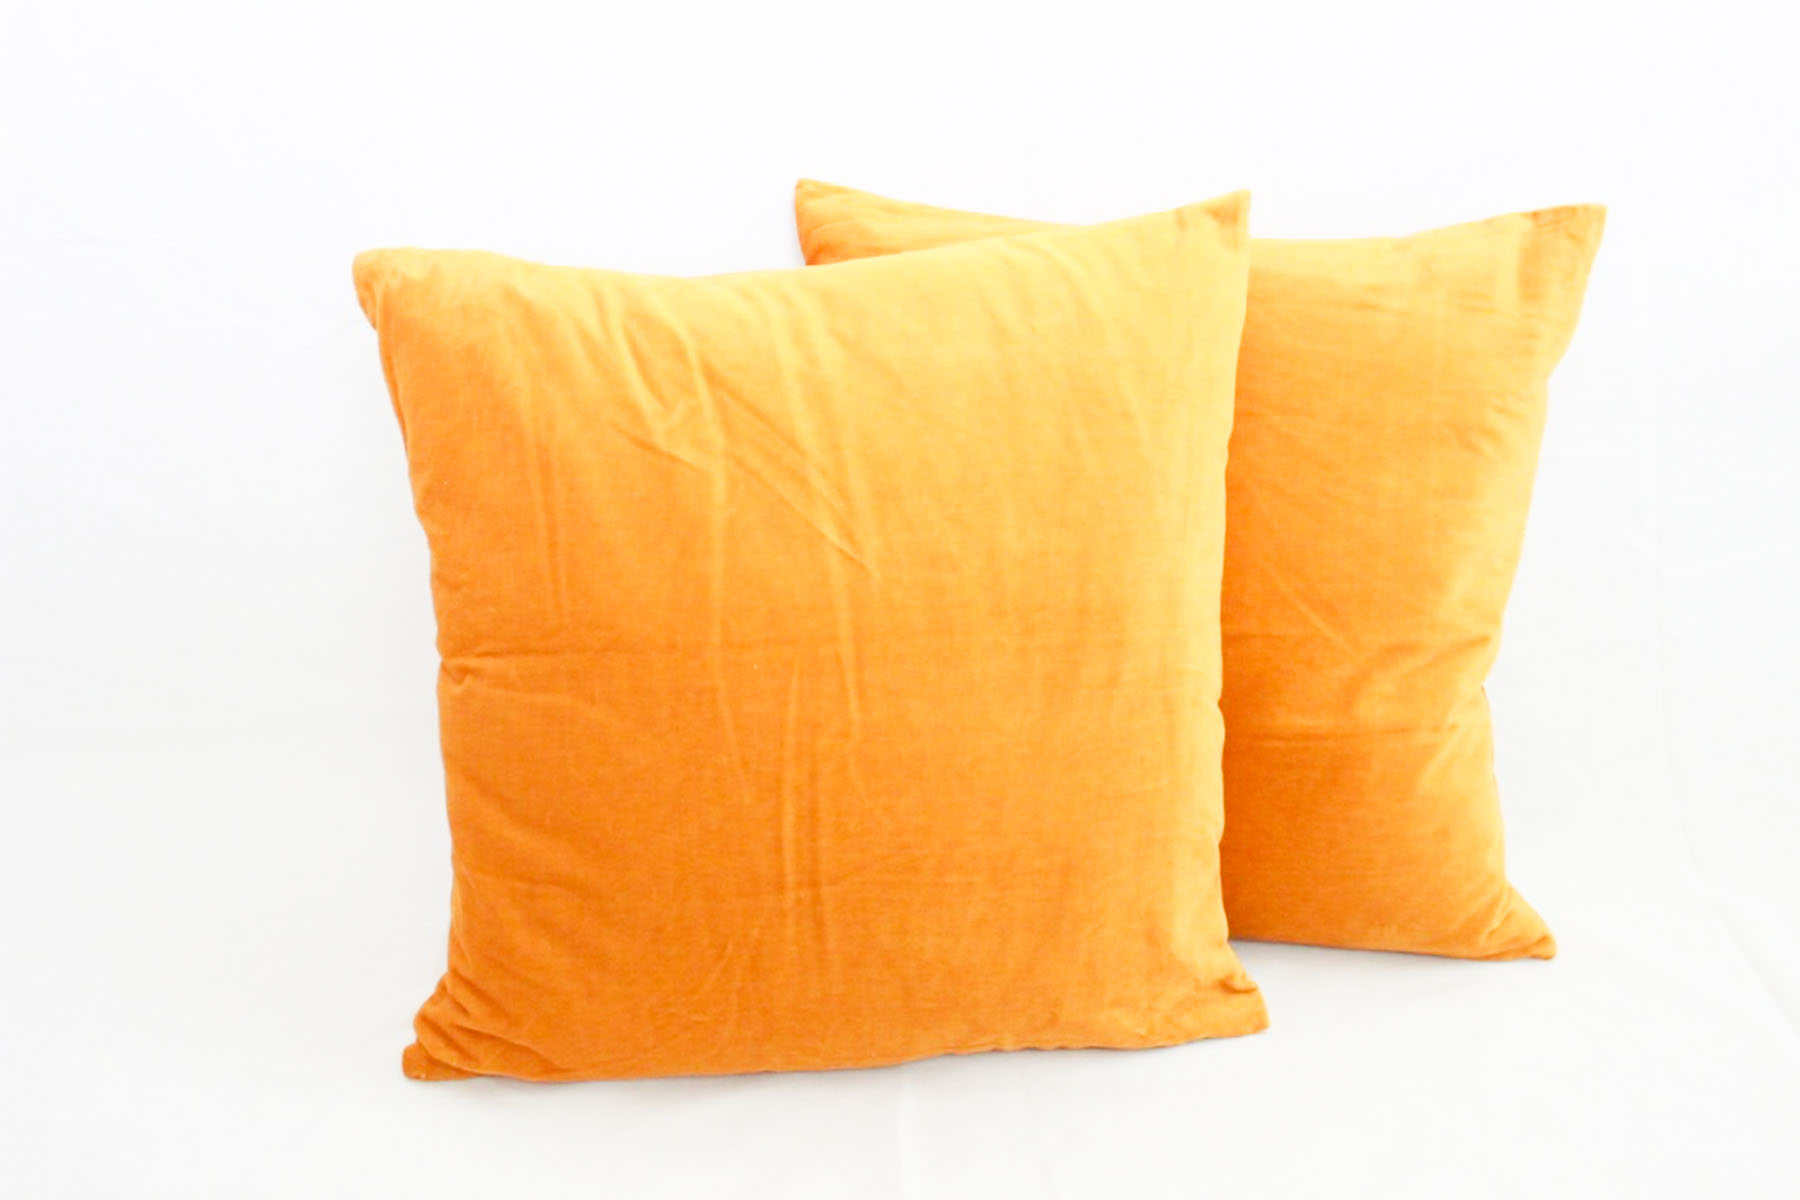 Mustard Yellow Velvet PIllows - Scavenged Vintage